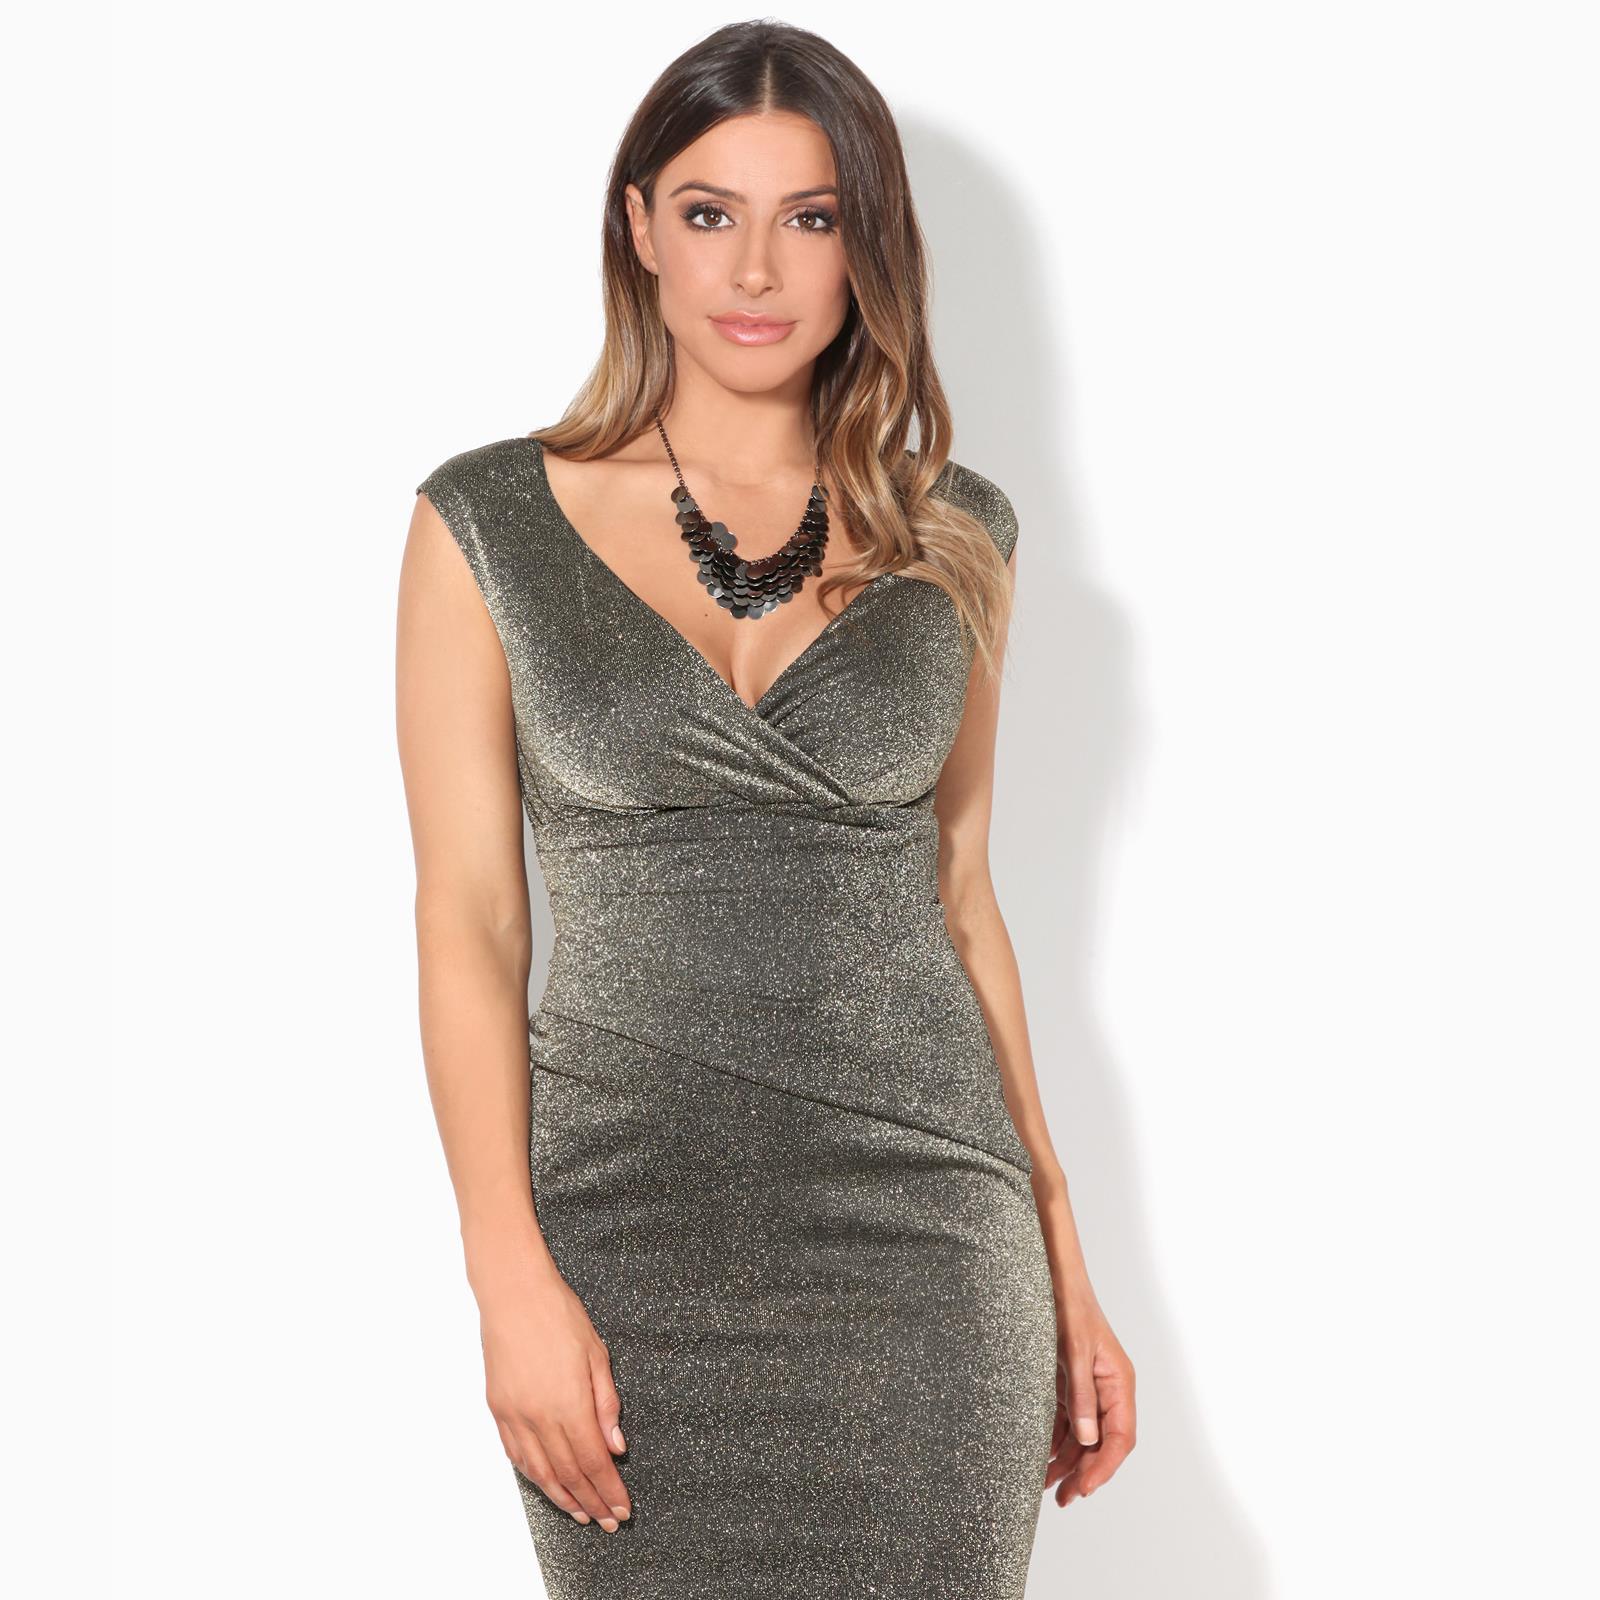 Womens-Ladies-Glitter-Party-Dress-Evening-Lurex-Fishtail-Maxi-Off-Shoulder thumbnail 3